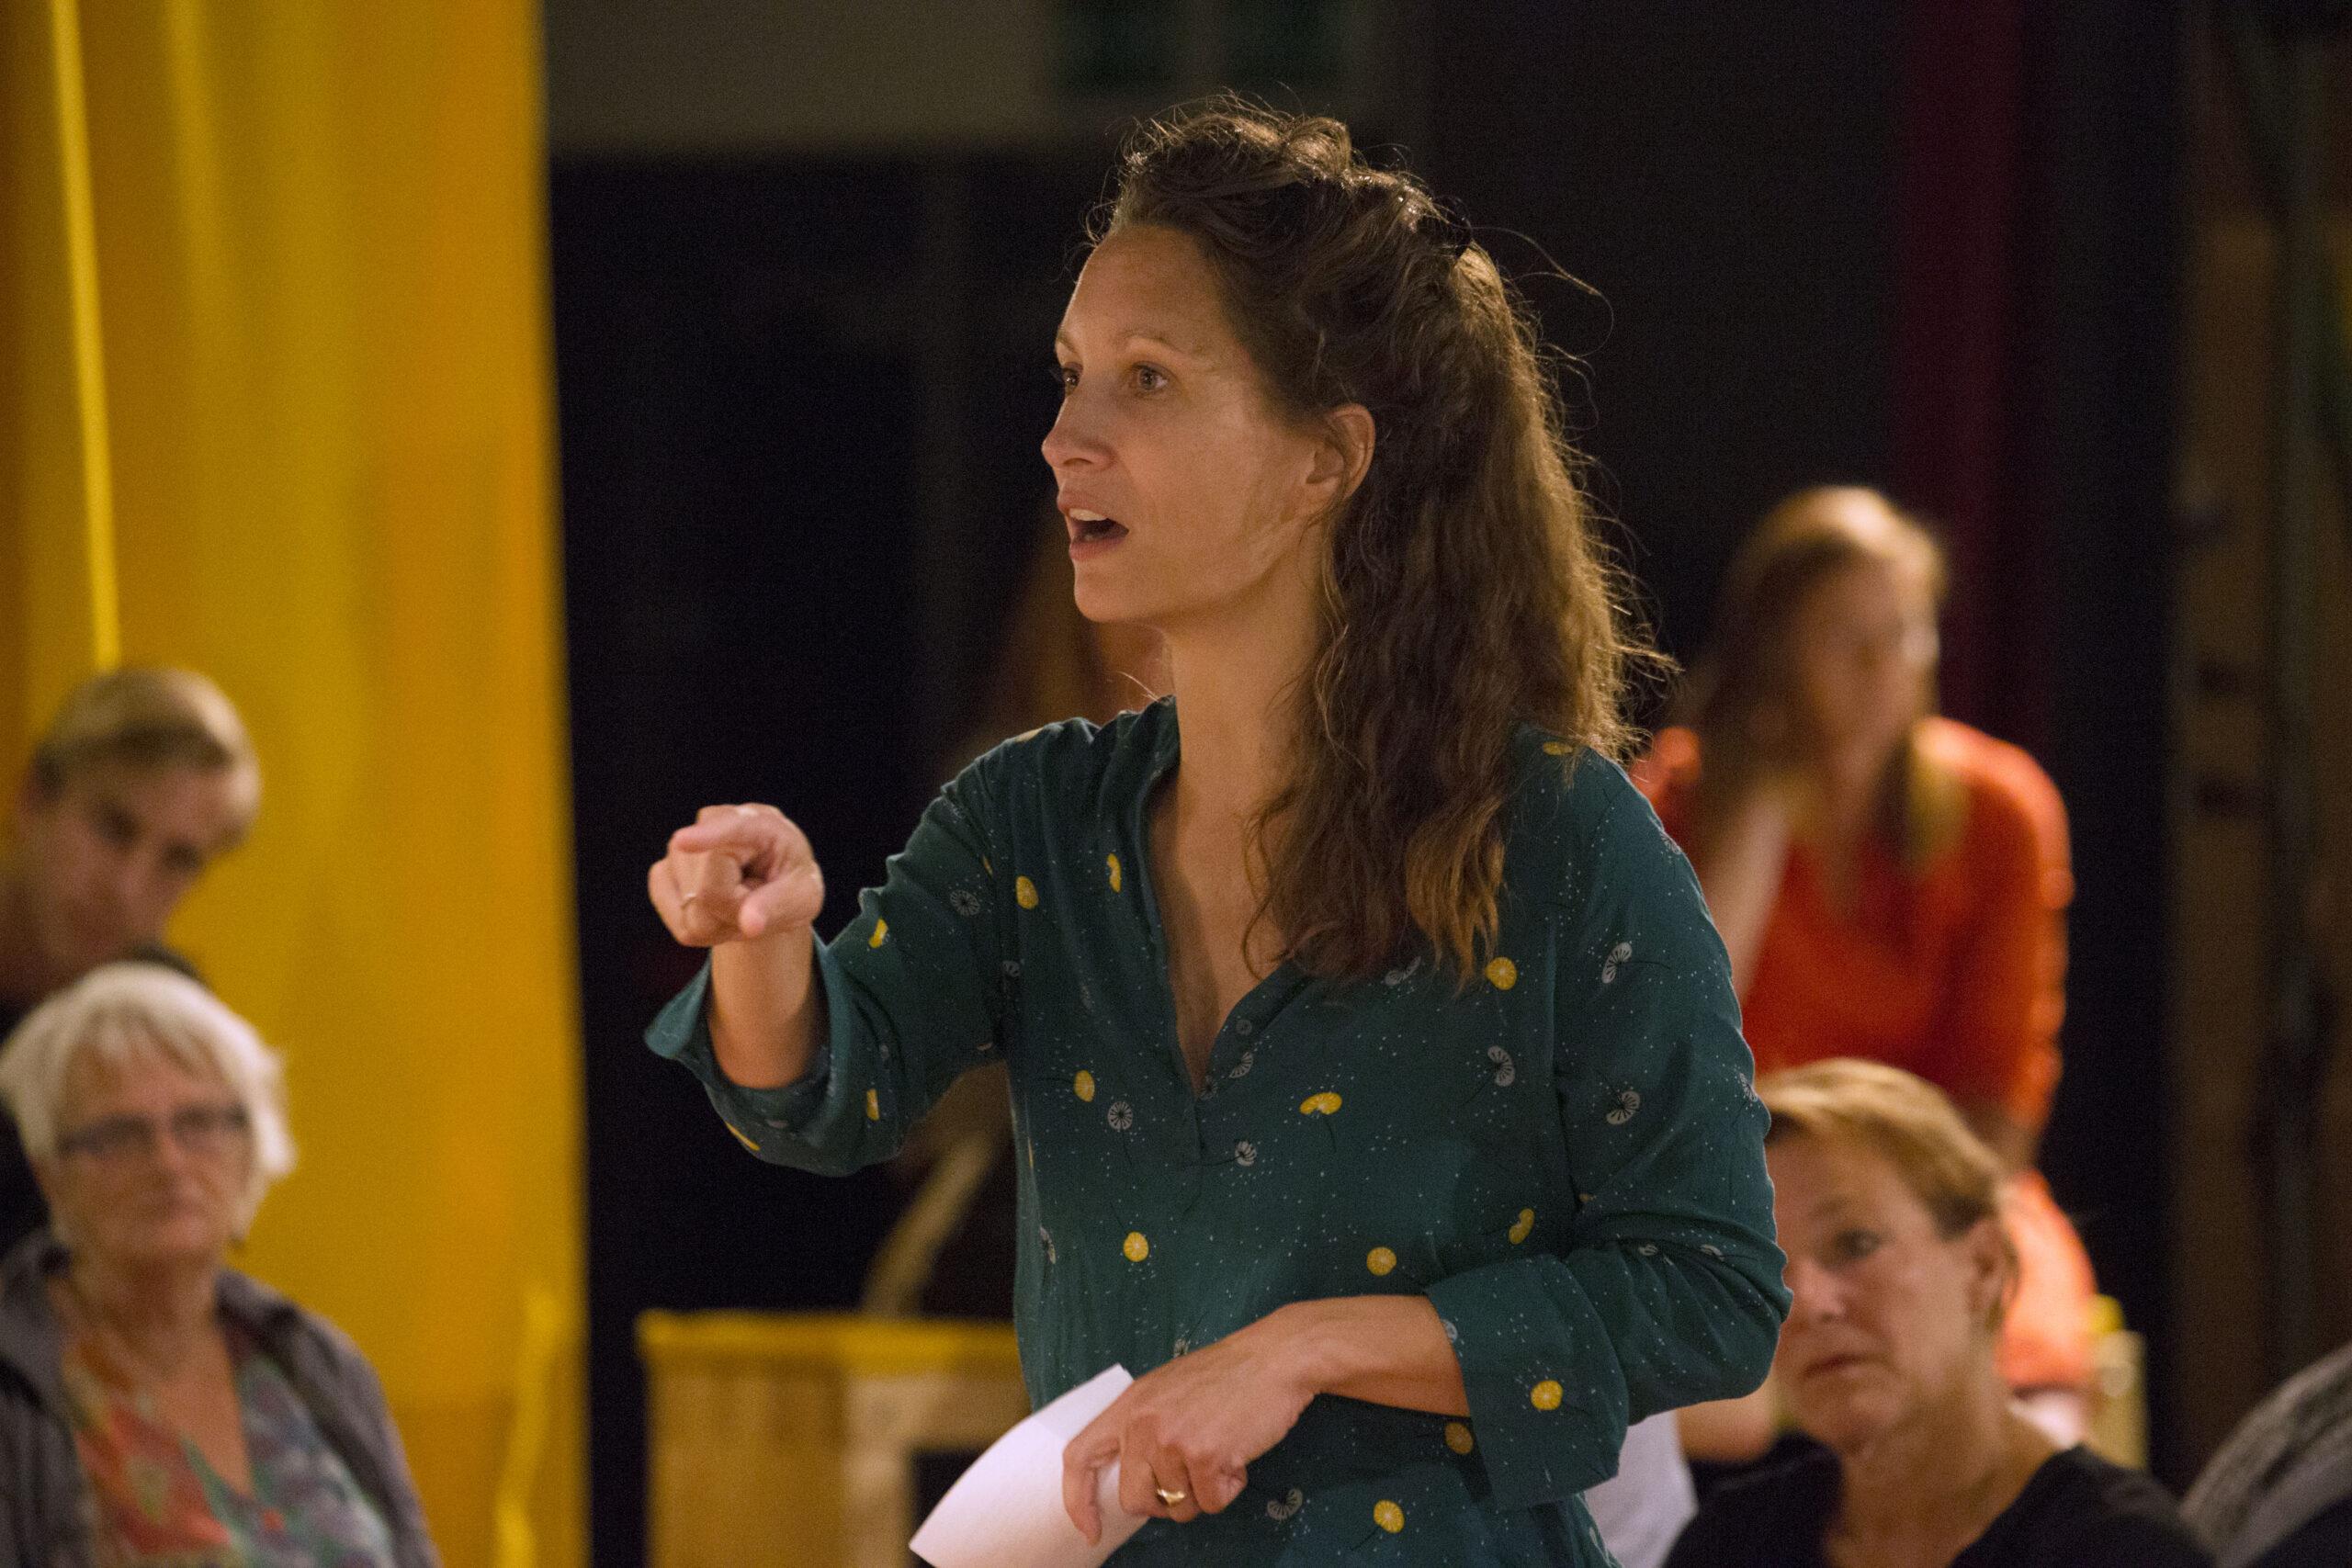 Verslag 'Salon: waan of werkelijkheid?' Breda